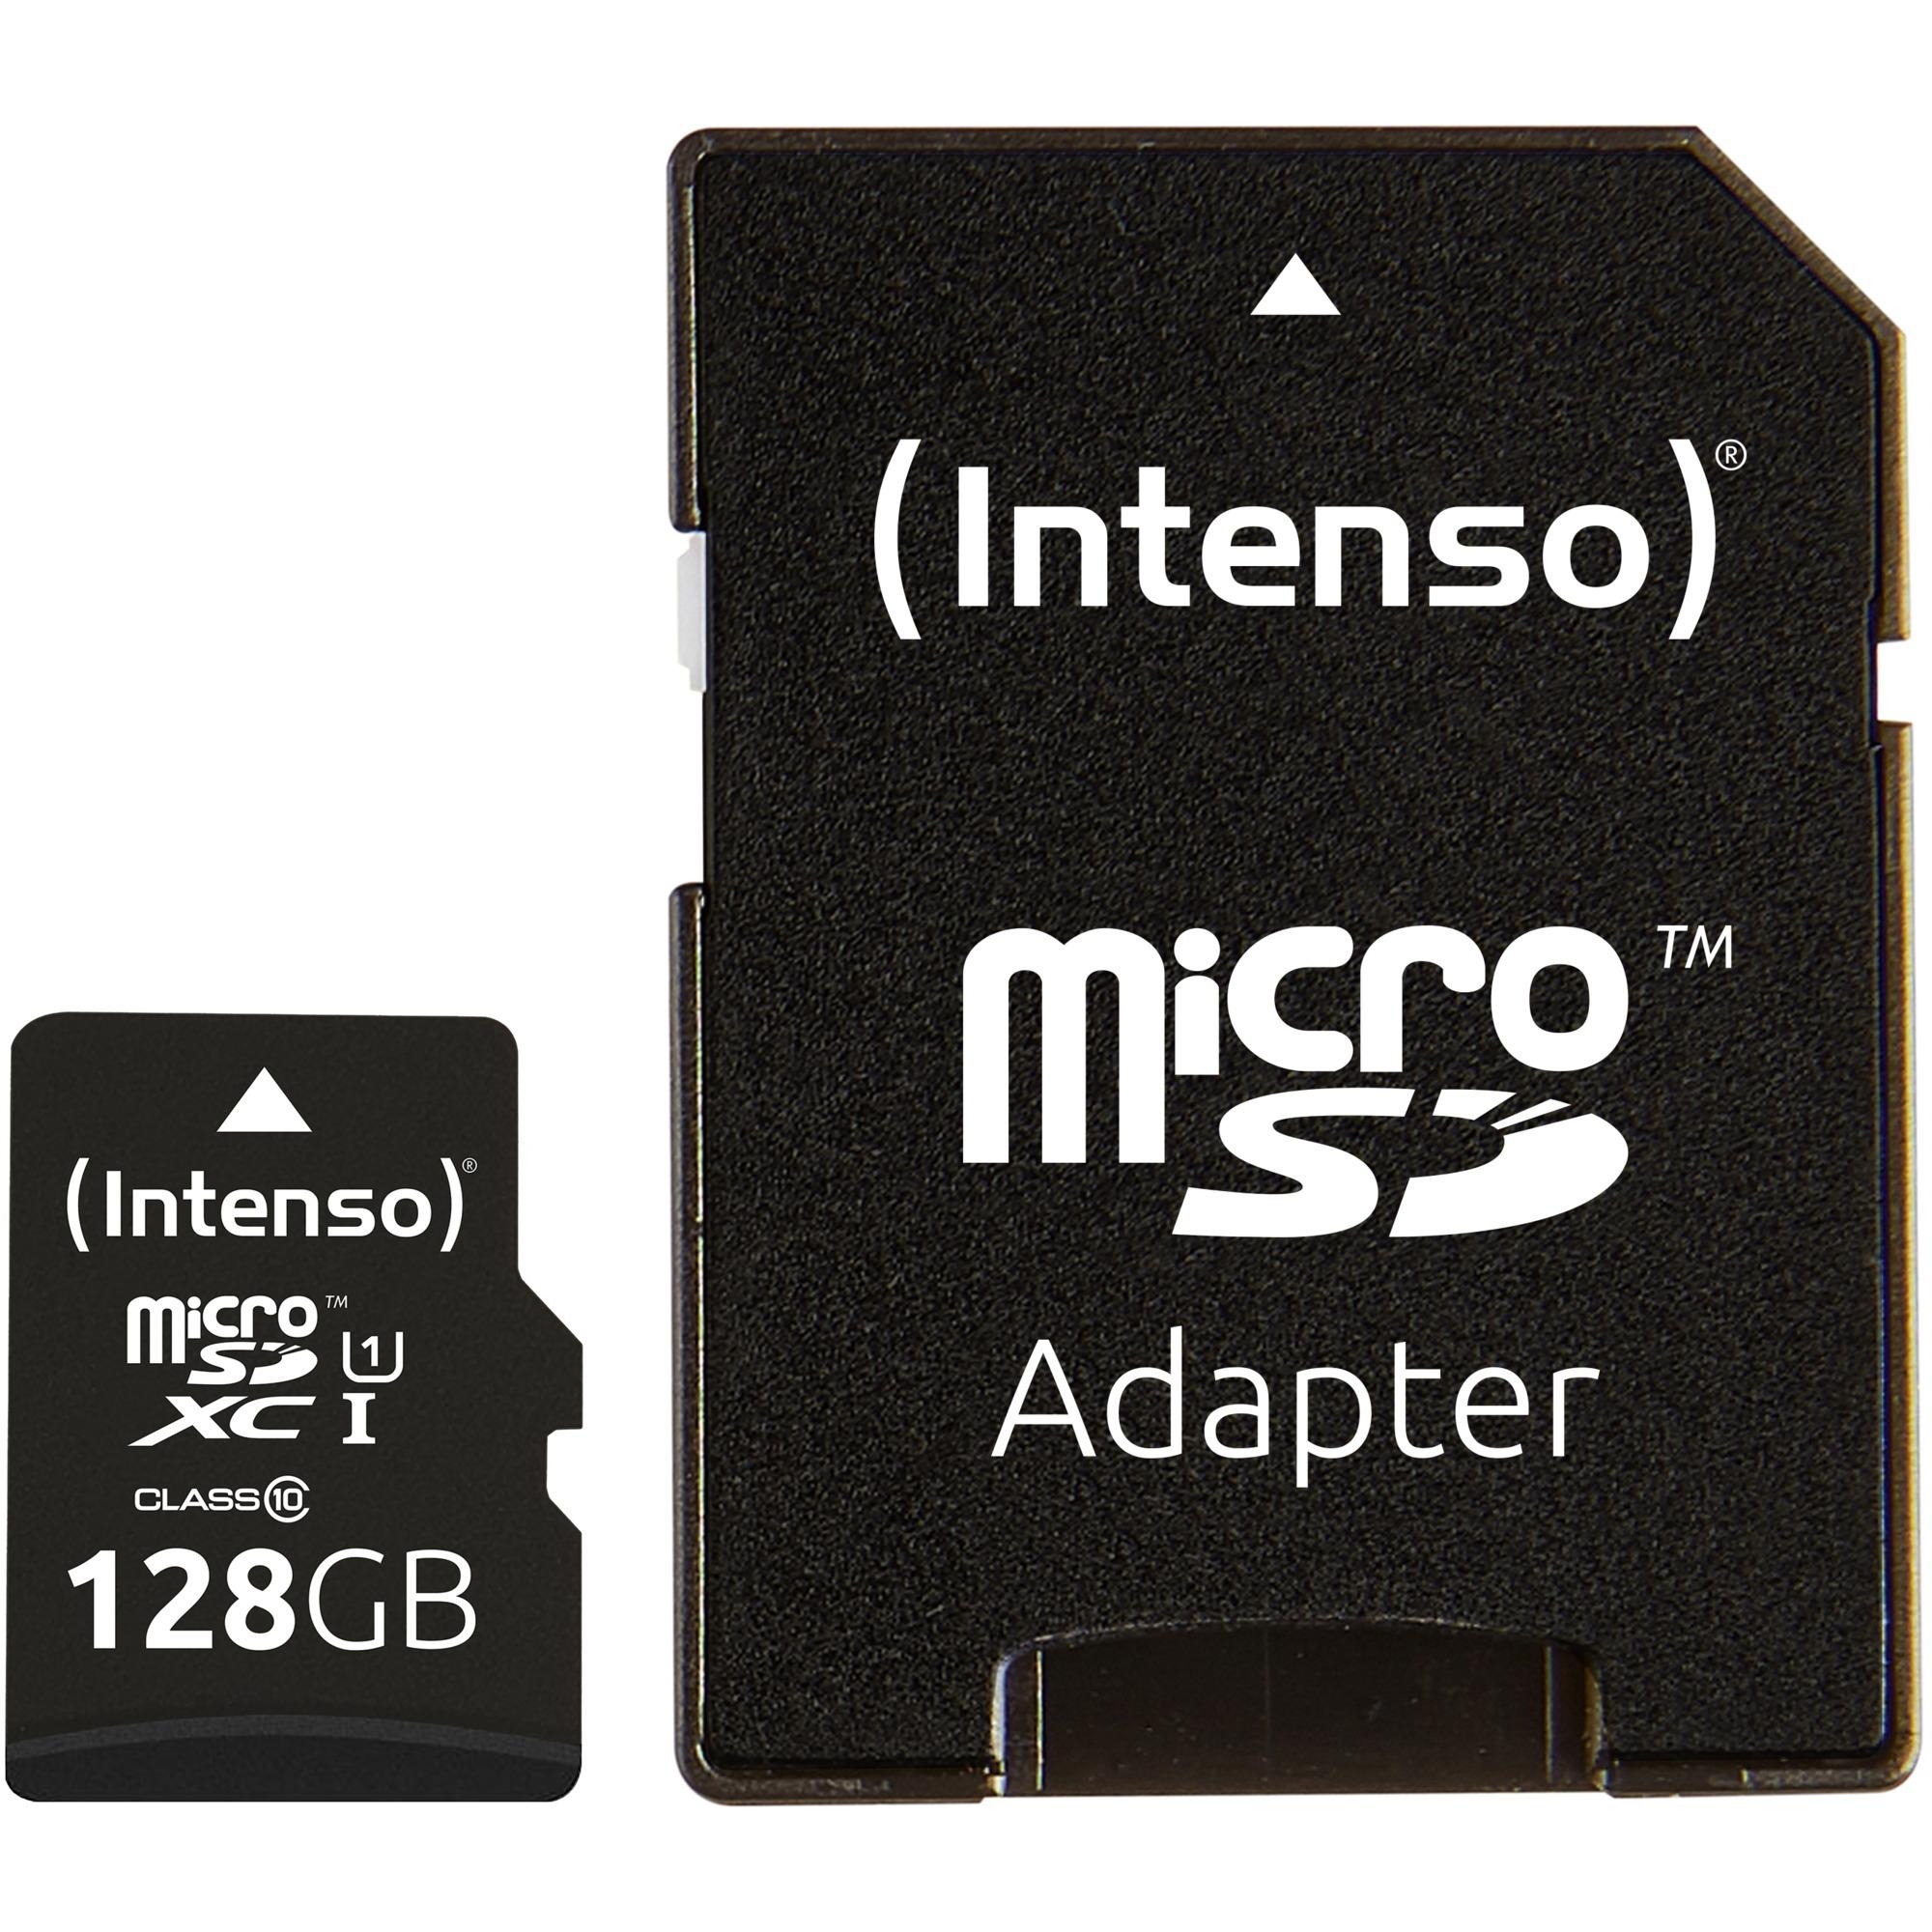 128GB microSDXC 128GB MicroSDXC UHS-I Clase 10 memoria flash, Tarjeta de memoria